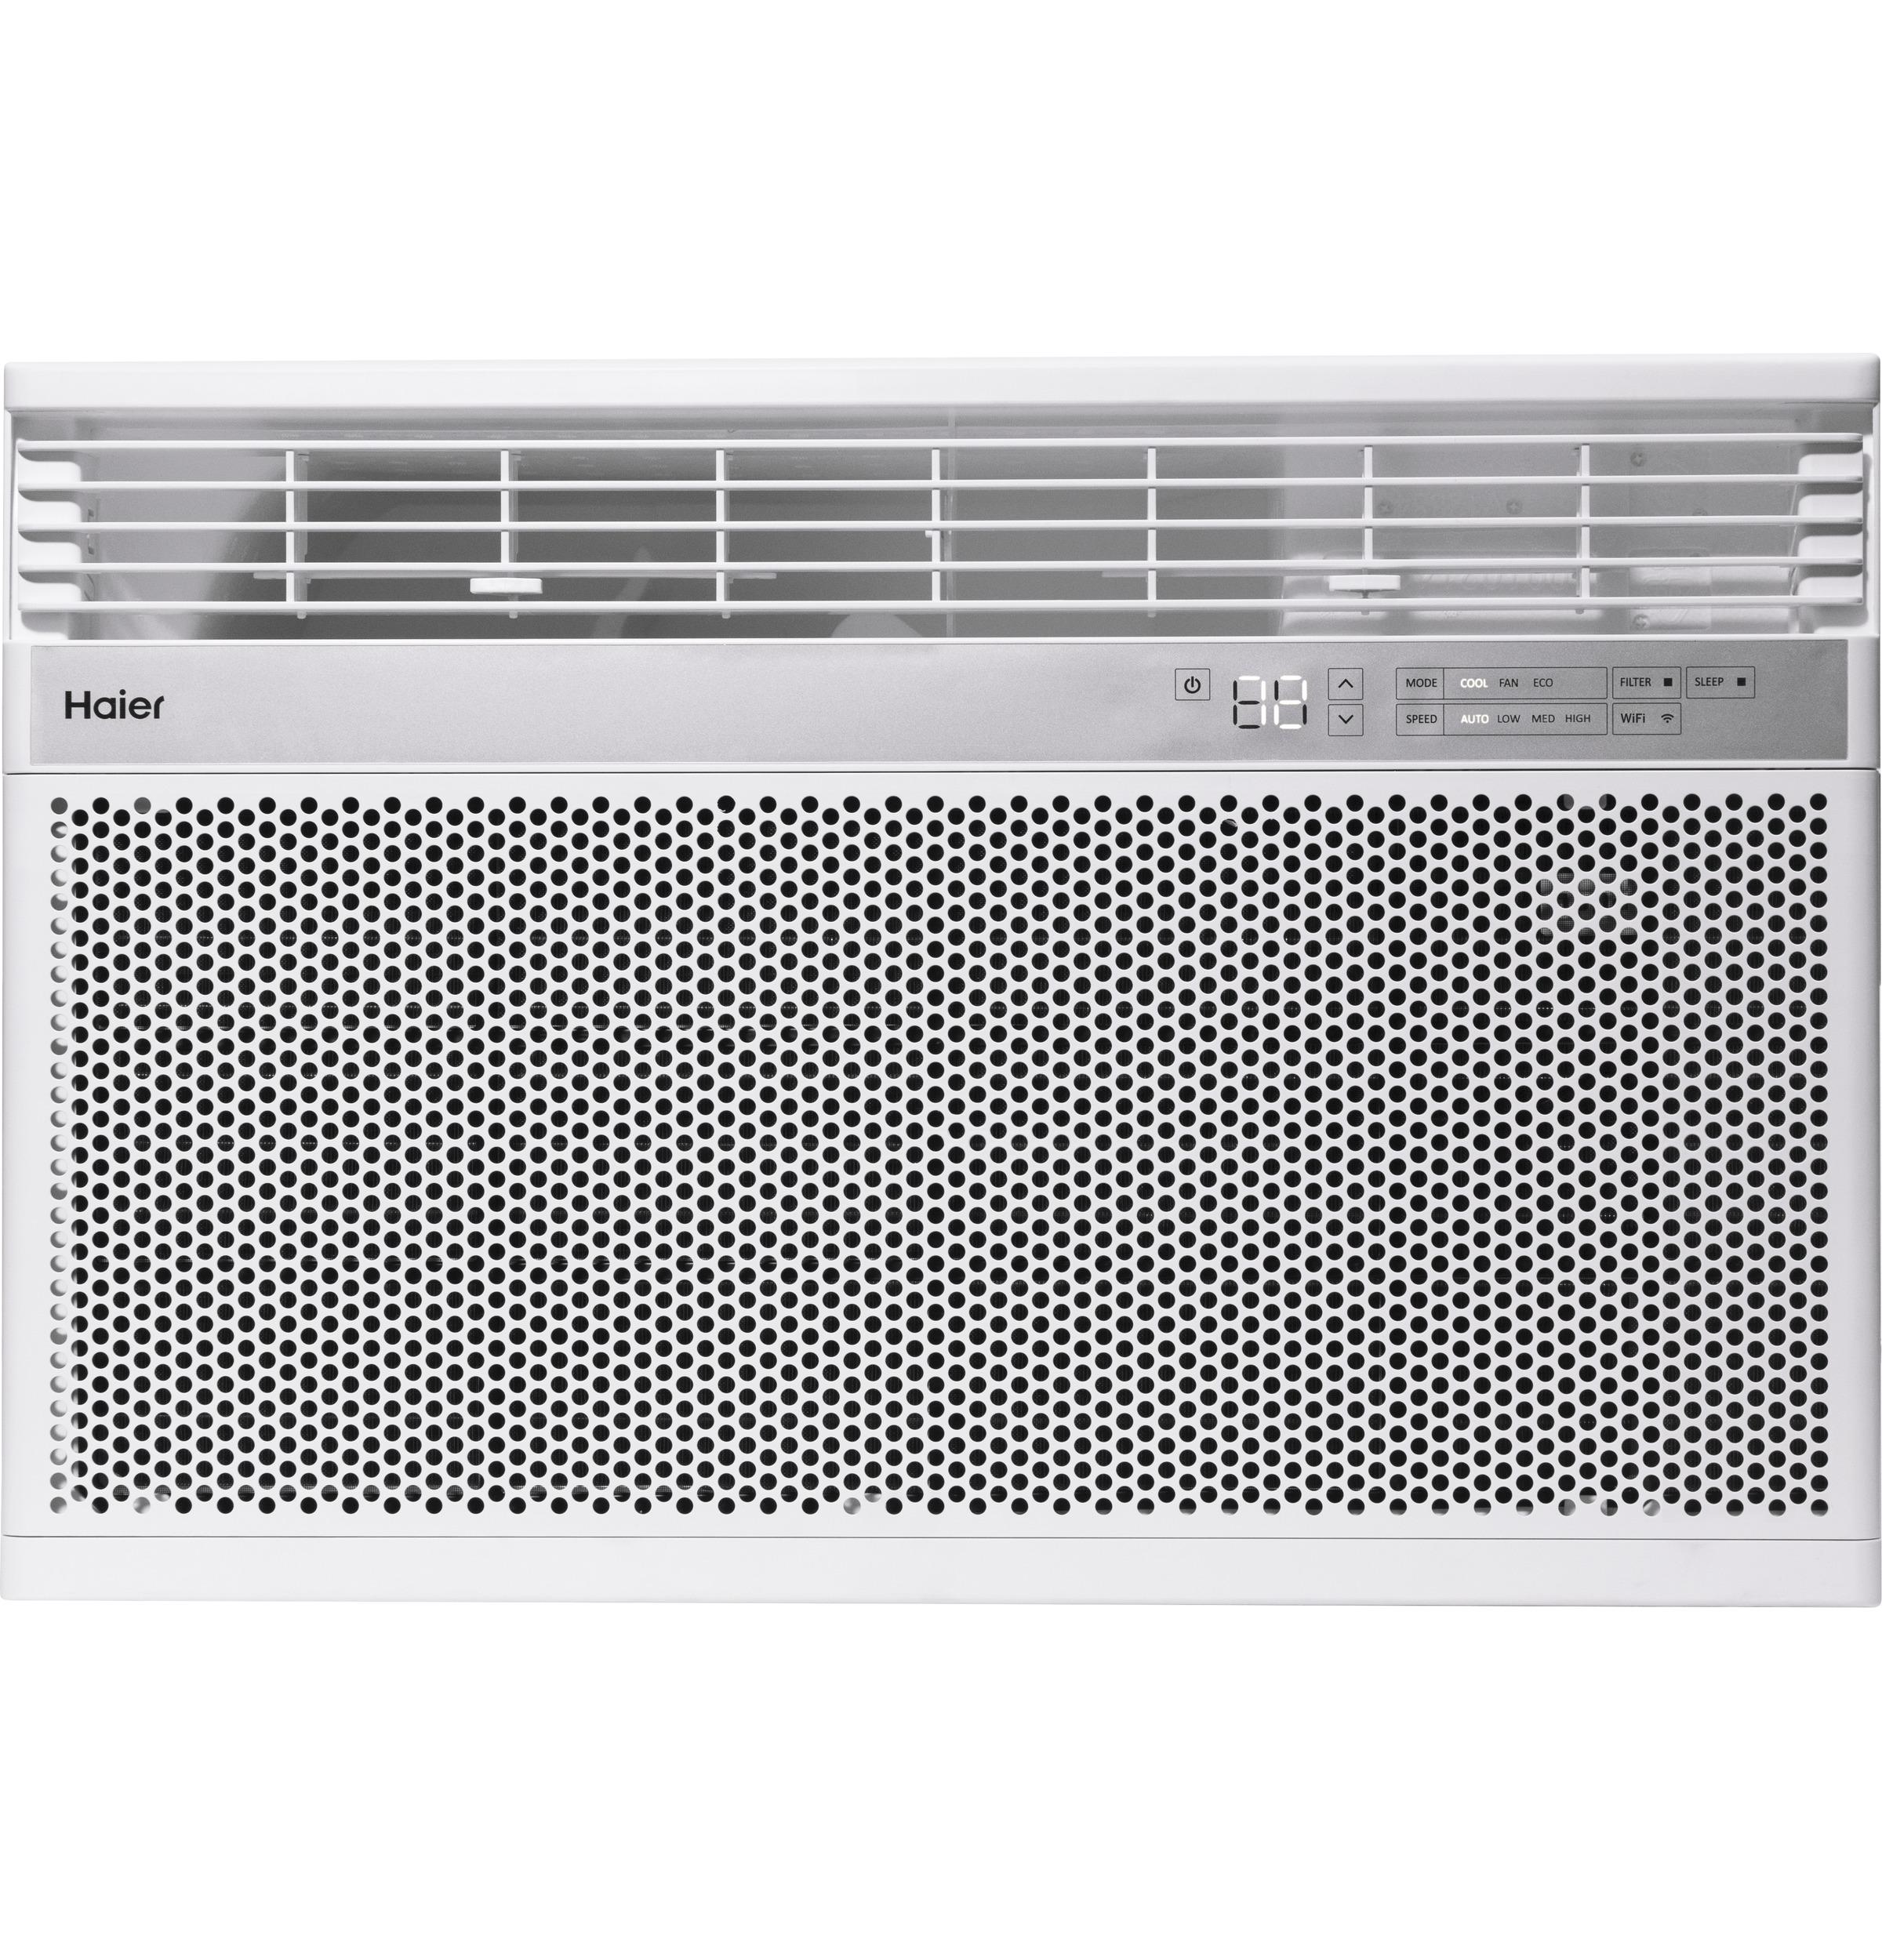 18,000 Btu Electronic Room Air Conditioner - 230 Volt